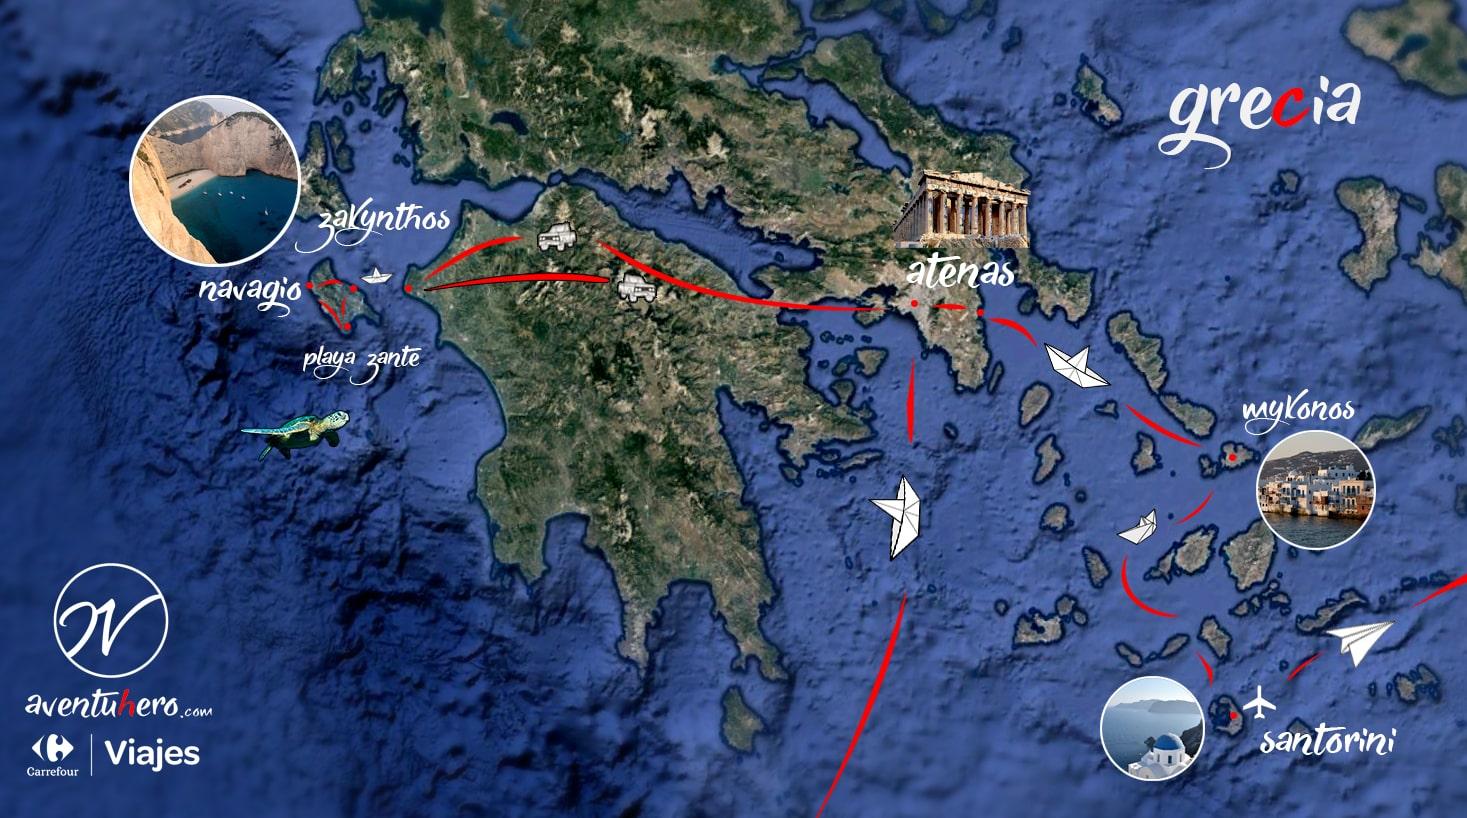 Mapa viaje aventuhero